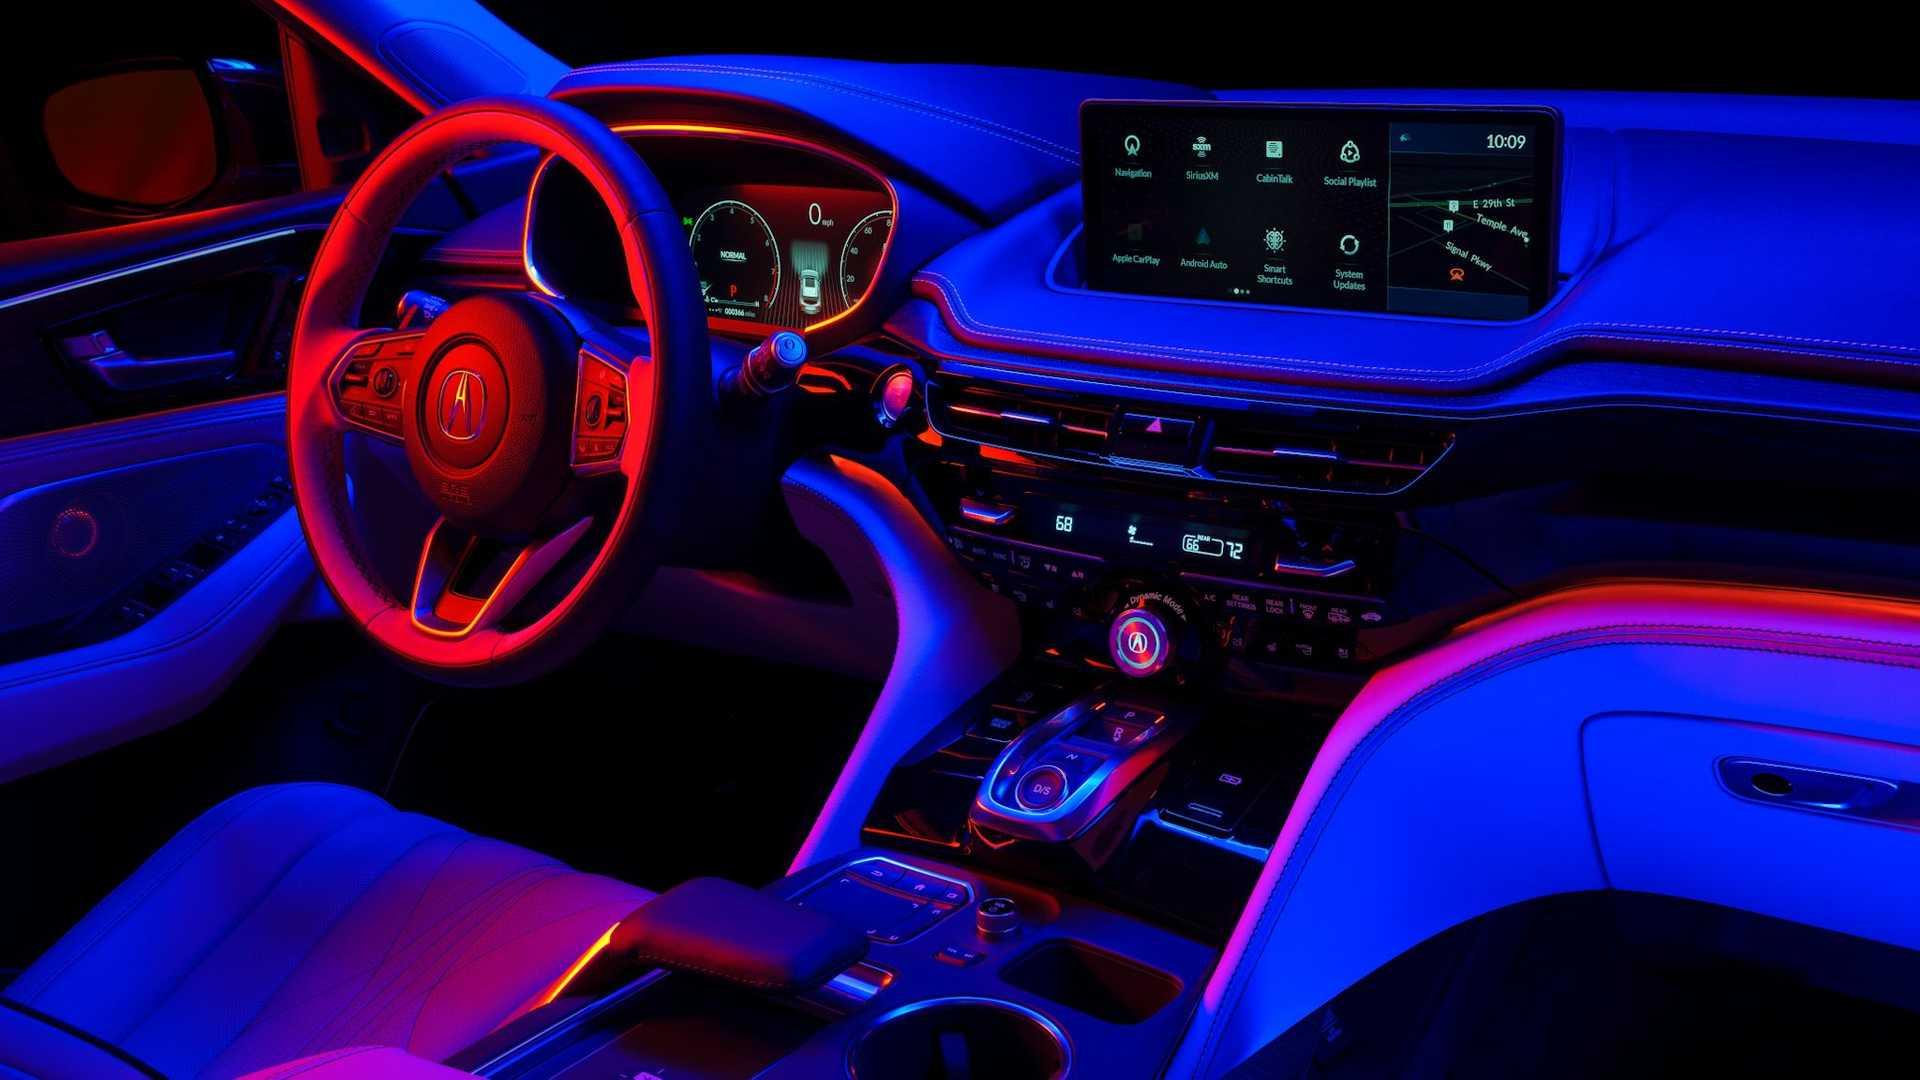 Acura MDX teaser photos show an upscale interior